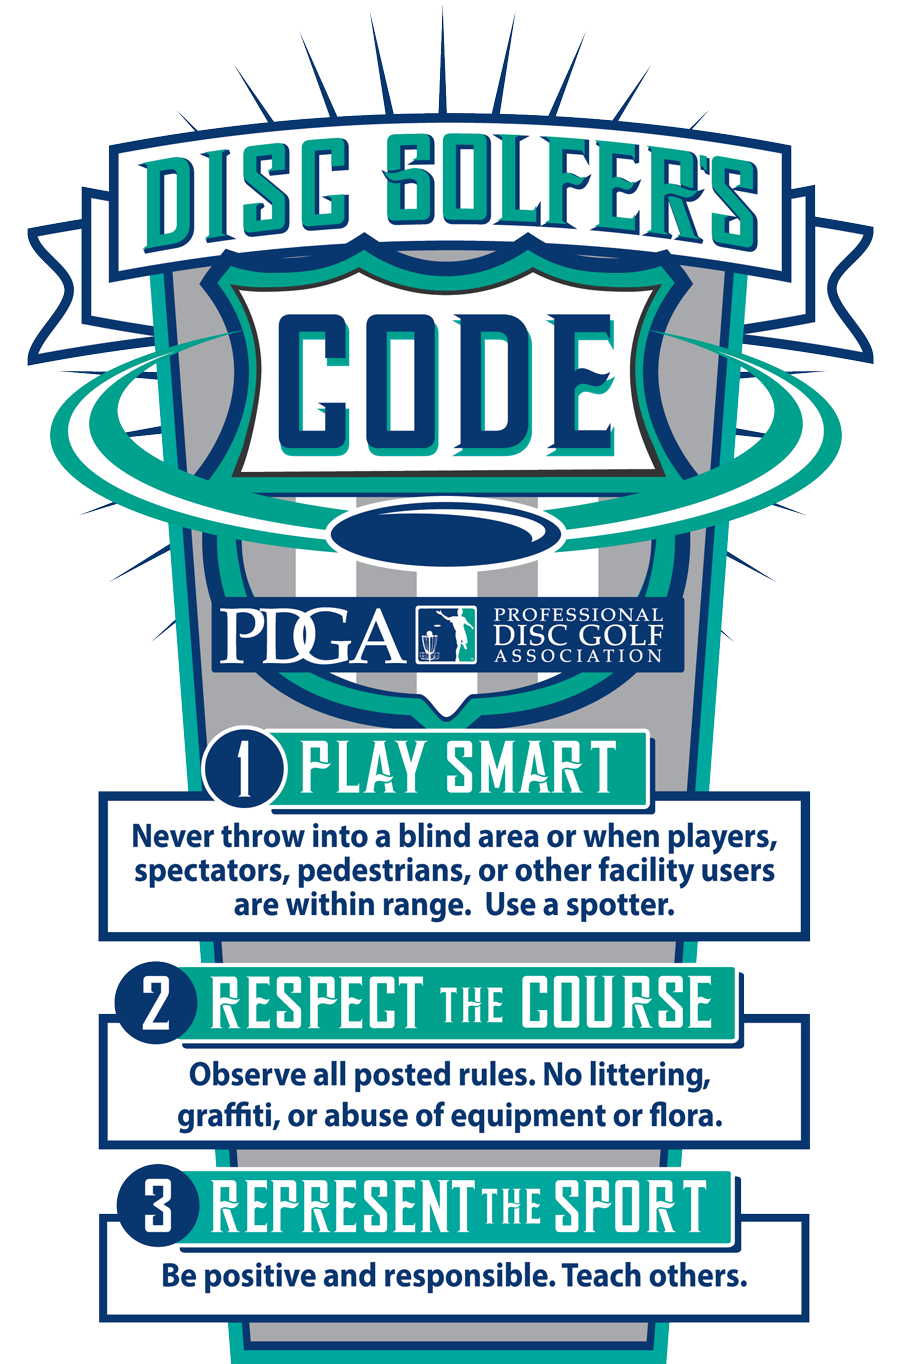 disc-golfers-code-v2-900x1364.png